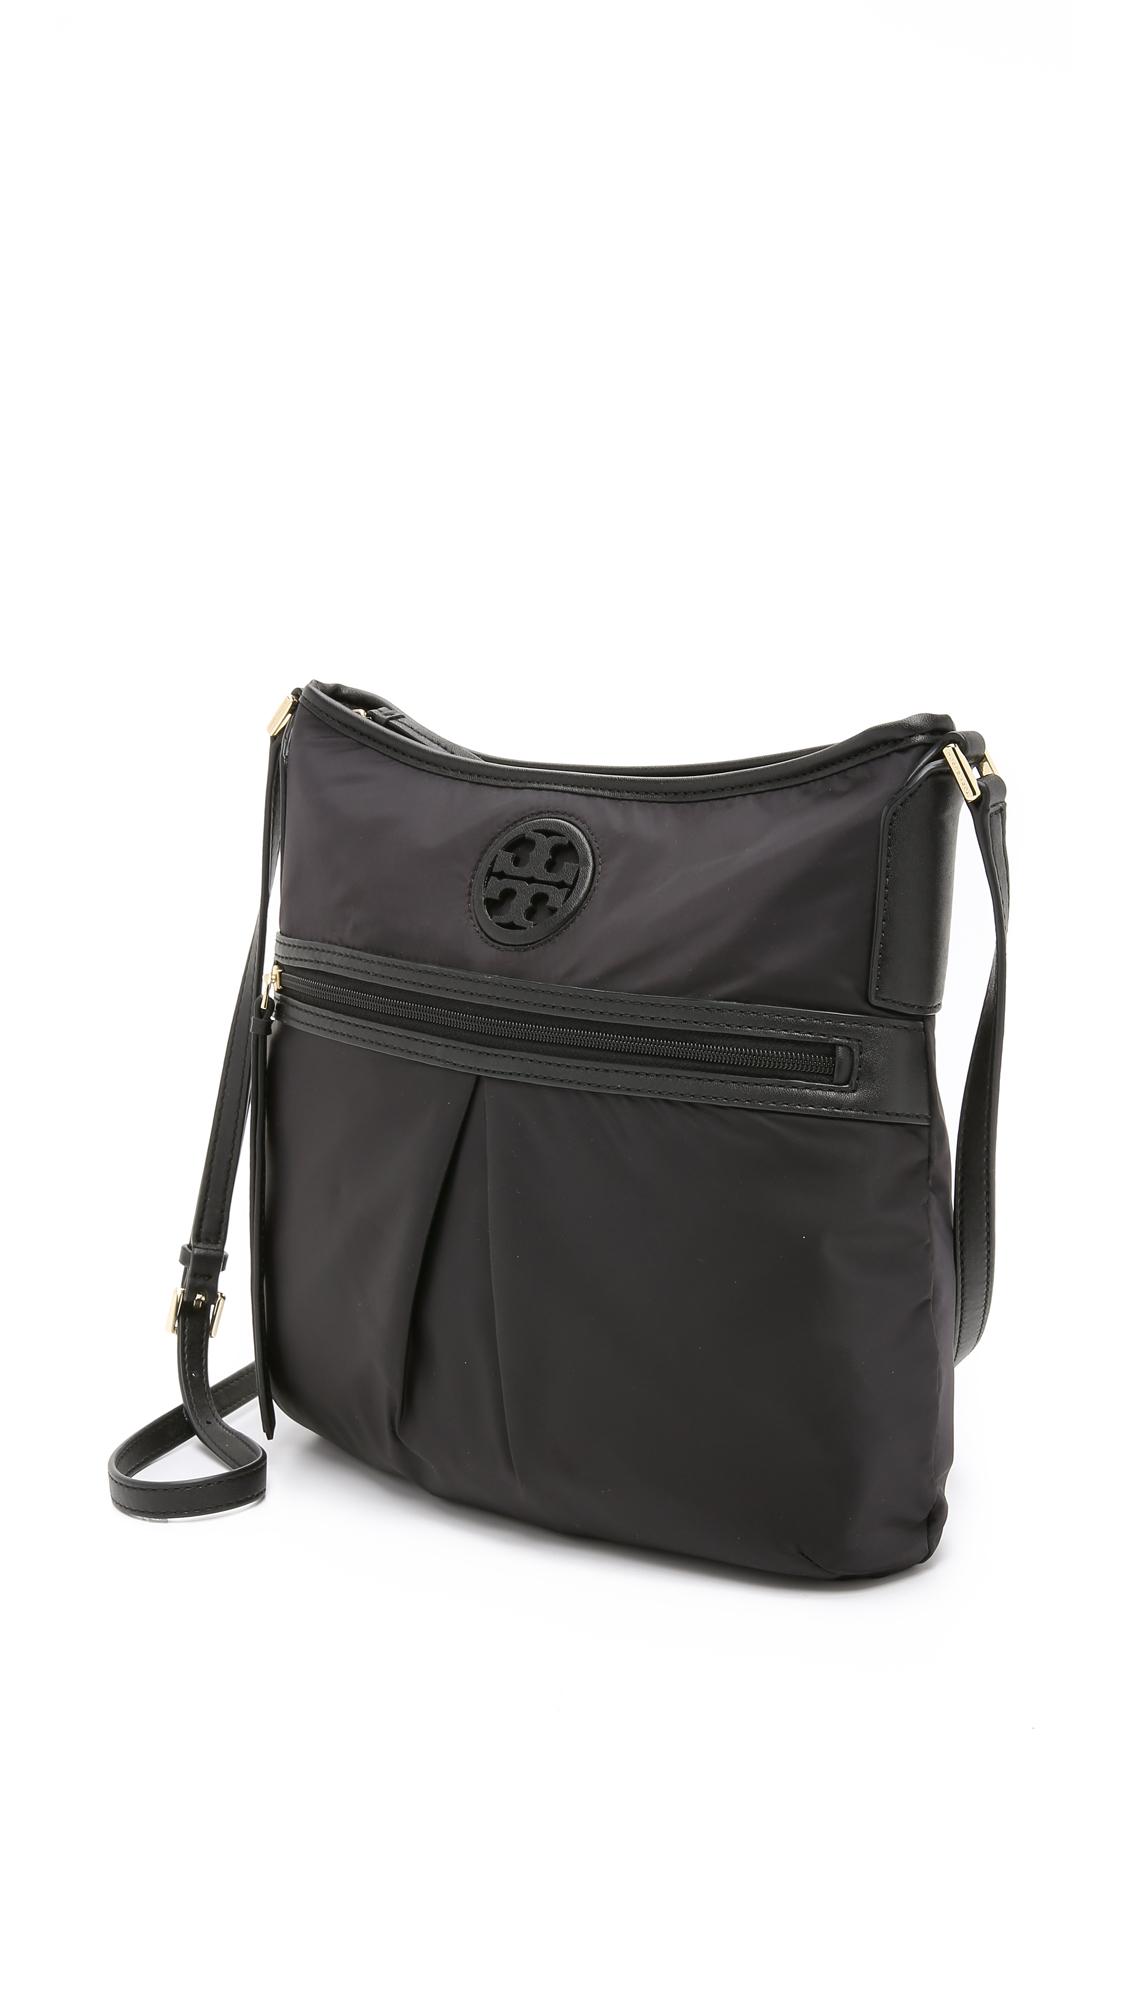 38c55d565e8 Lyst - Tory Burch Nylon Swingpack Bag - Black in Black